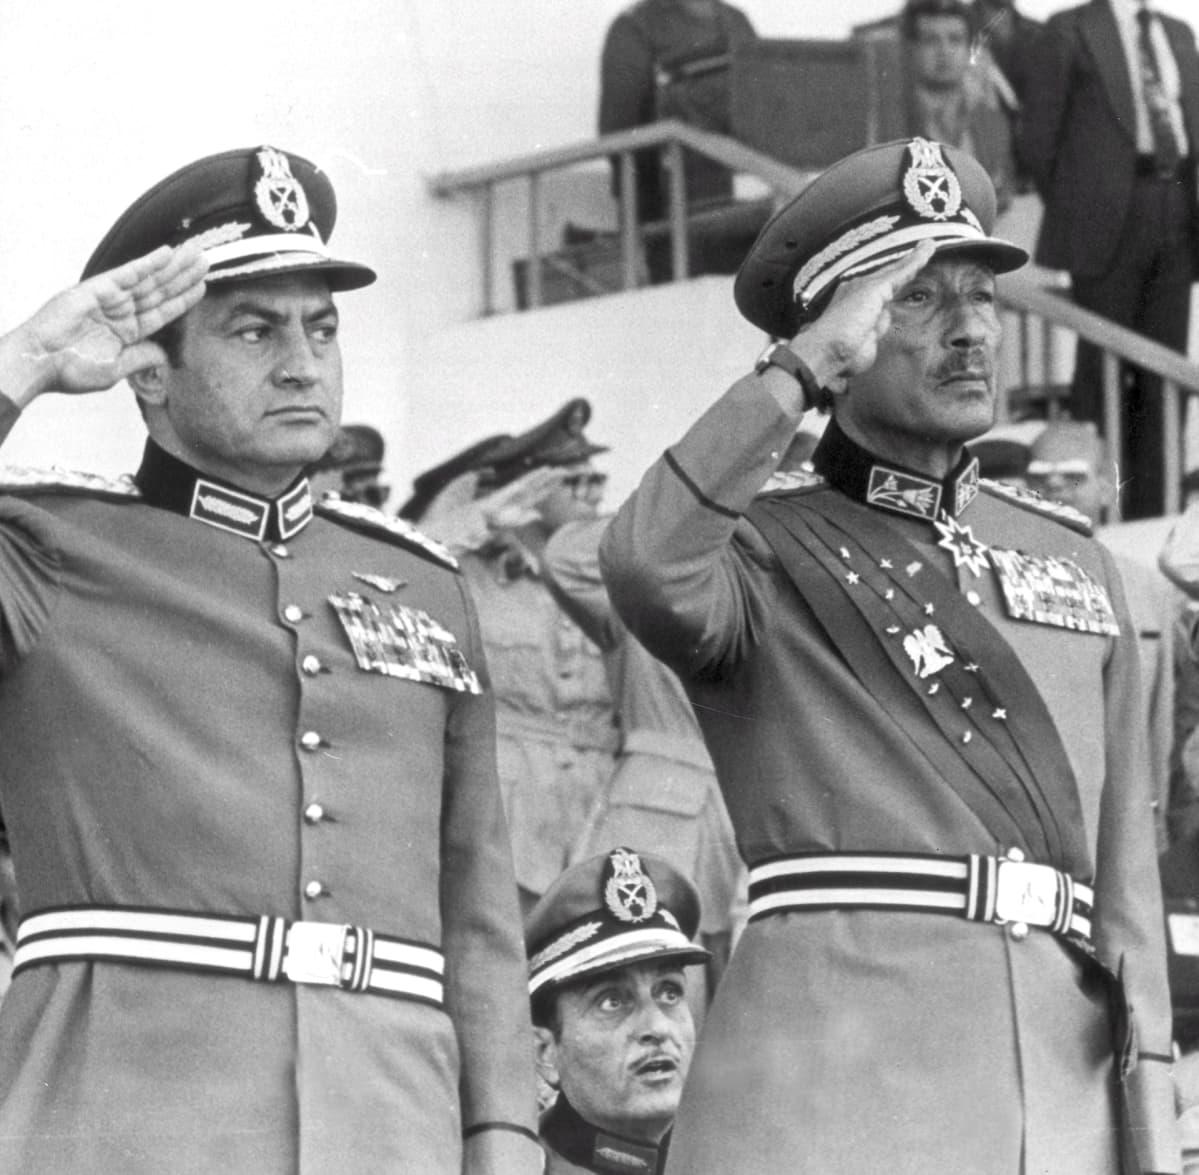 Hosni Mubarak ja Anwar al-Sadat sotilasparatiissa Kairossa 1981.